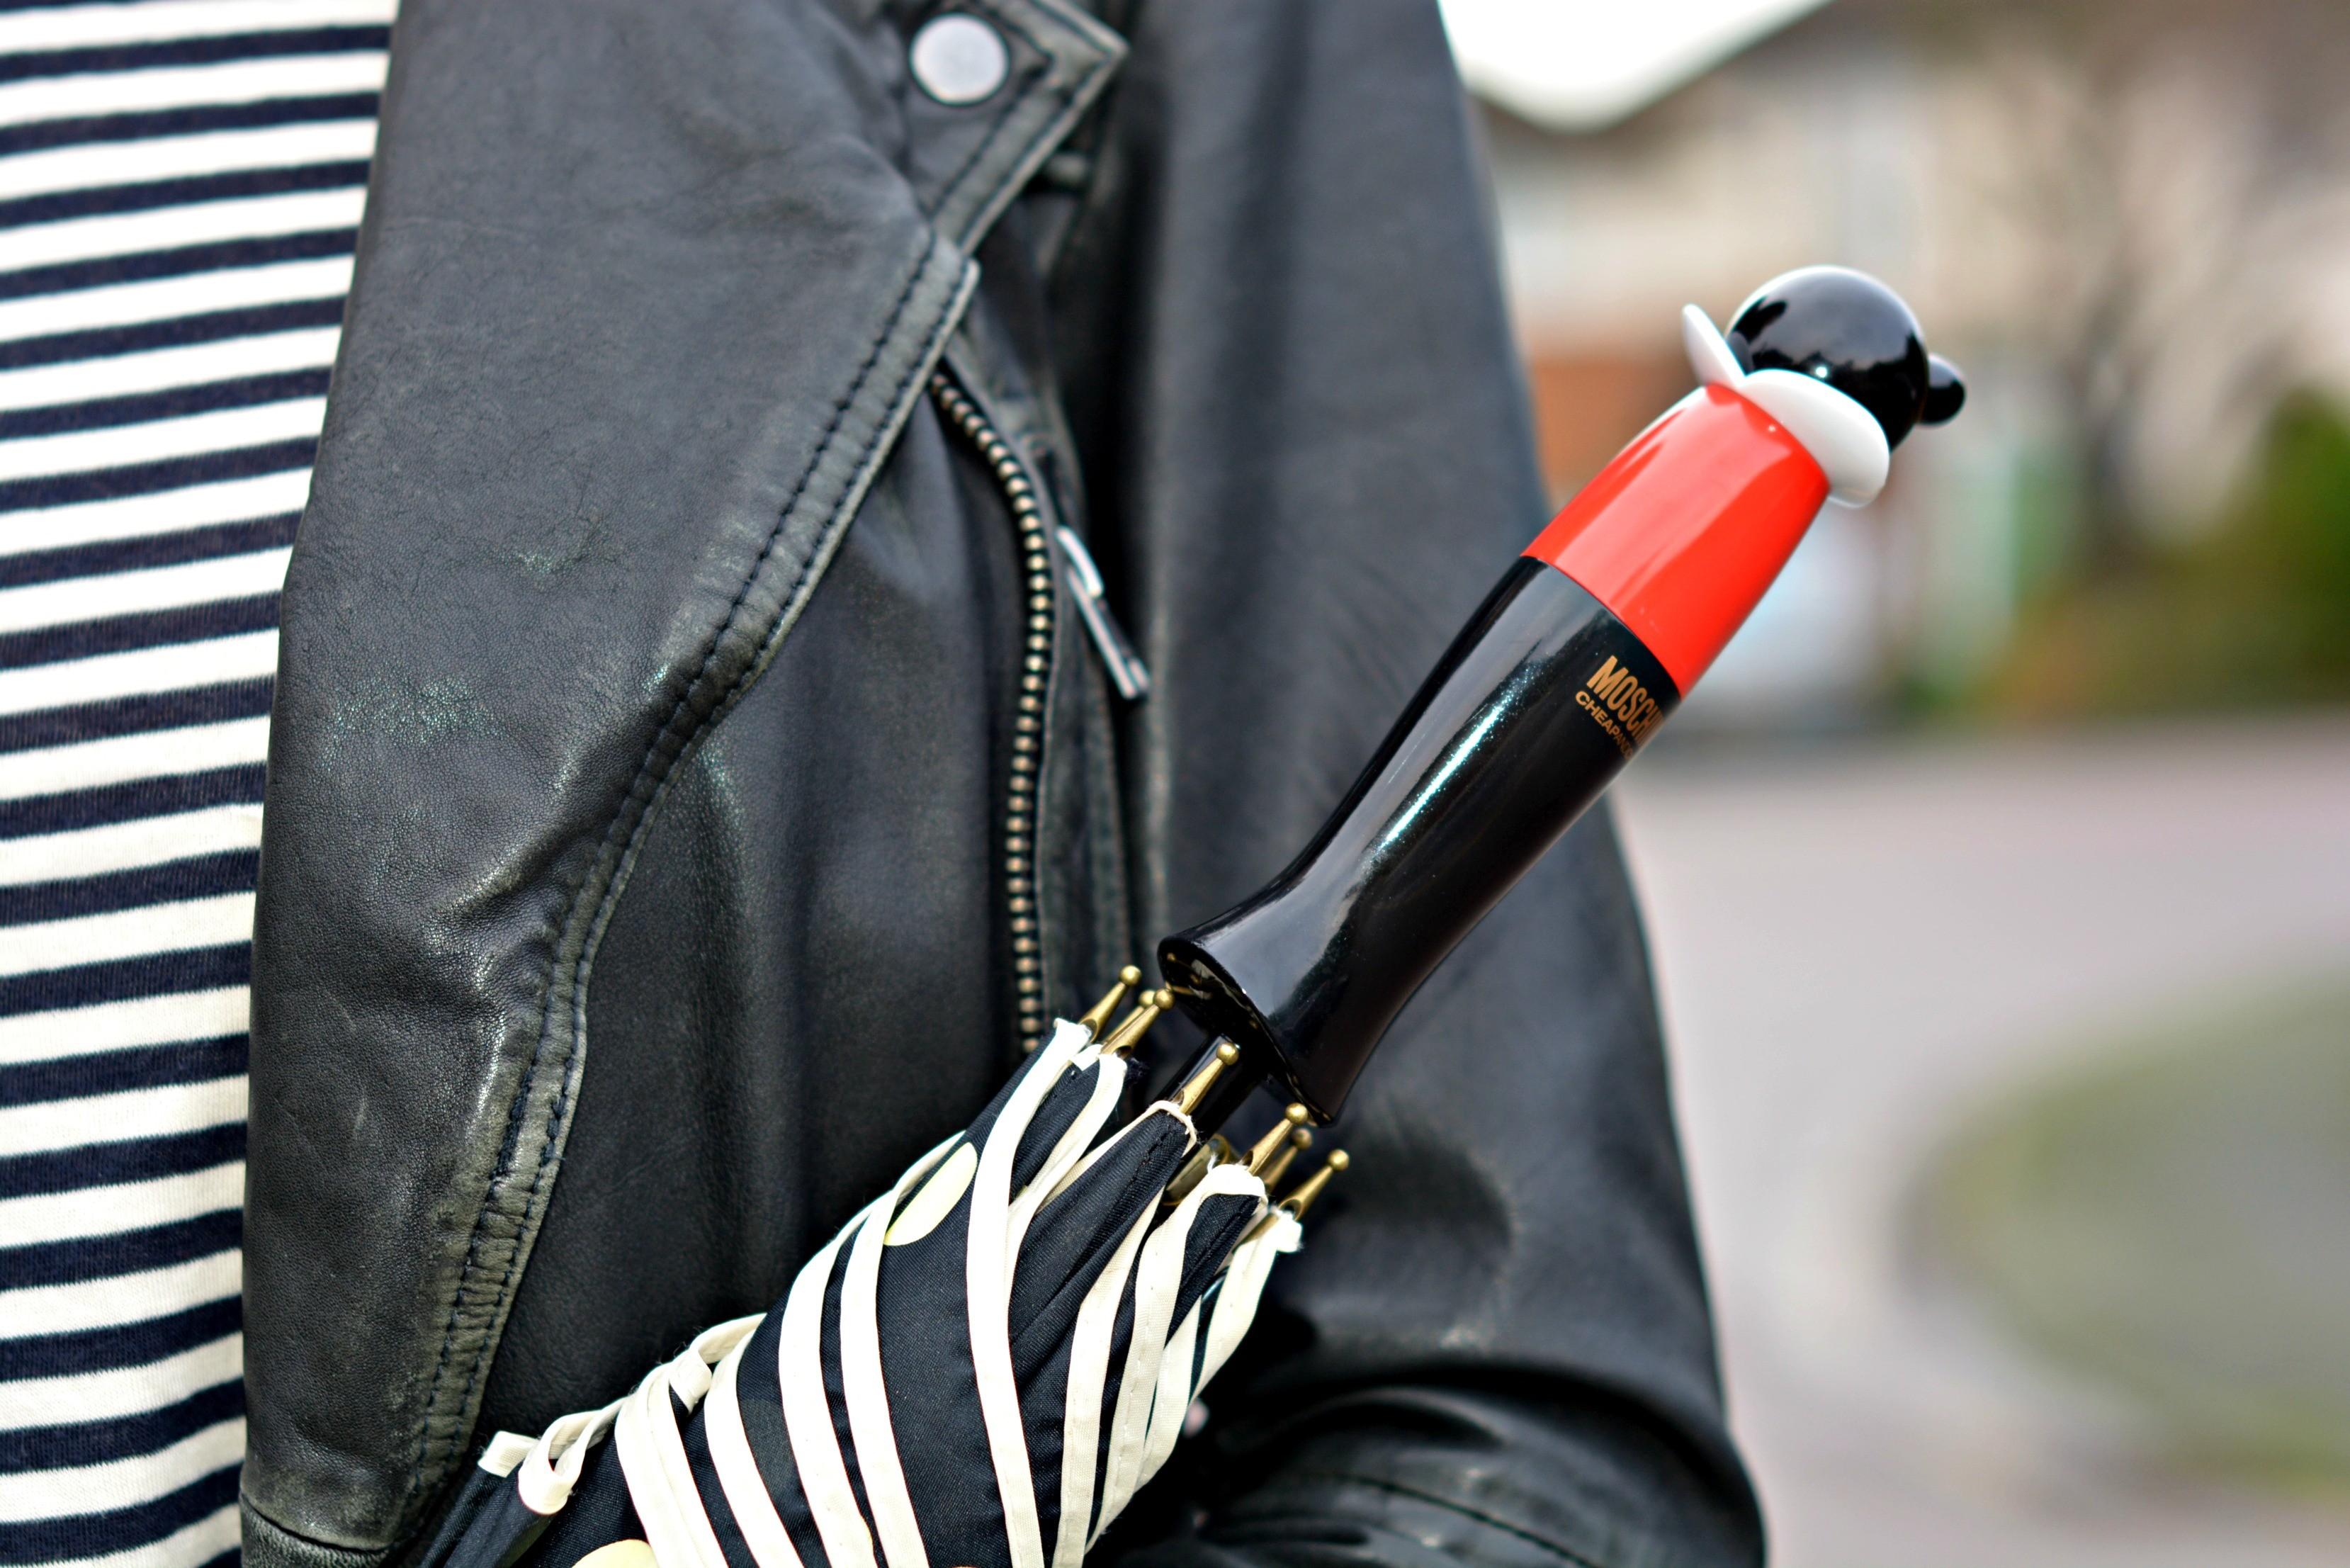 Moschino Cheap & Chic umbrella